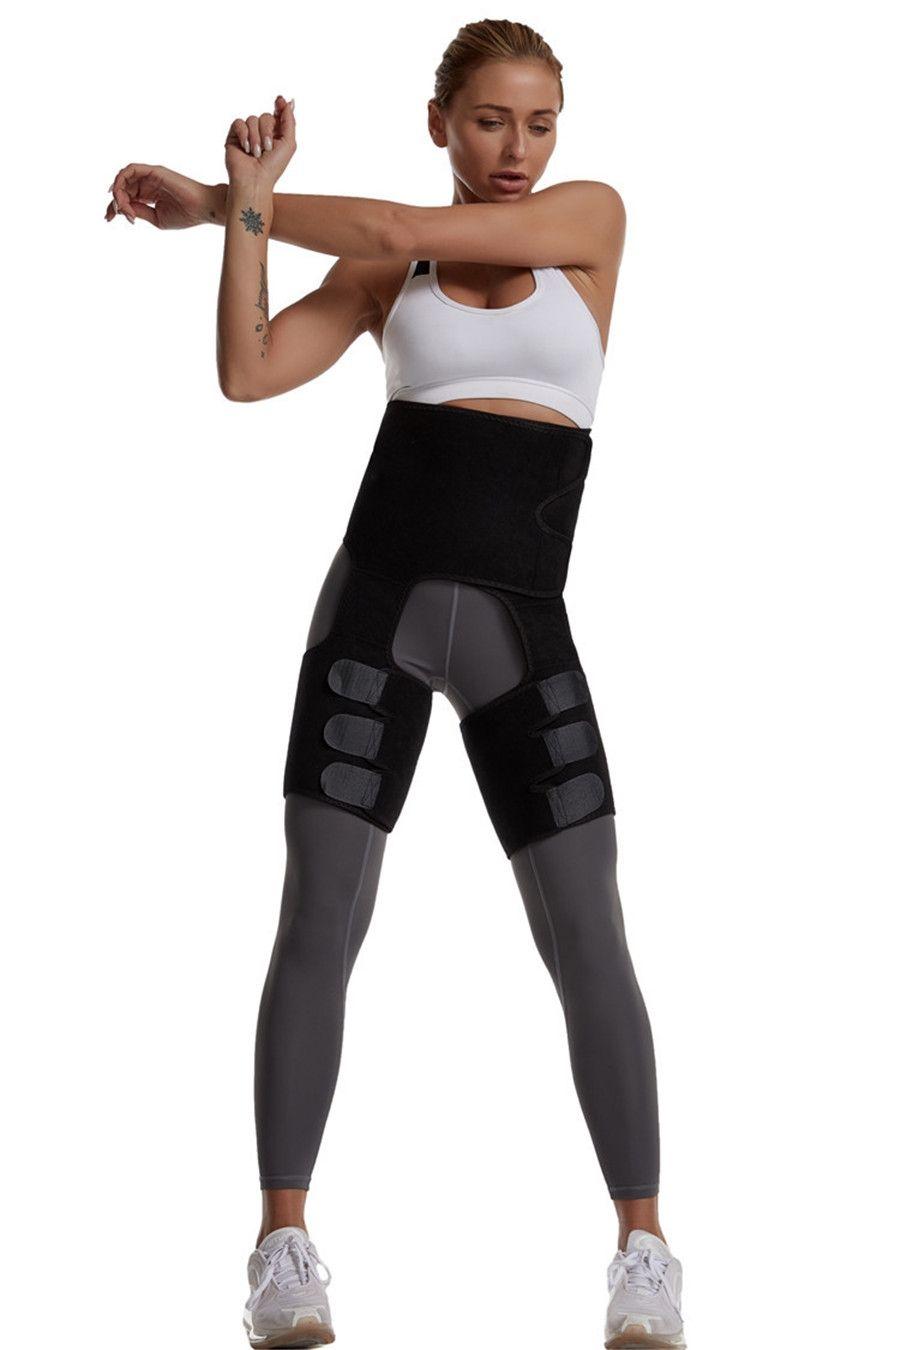 Homens cintura instrutor Vest Para Peso Ot Neoprene Corset Shaper Corpo Zipper Shapewear Sauna Slimming camisa # 676